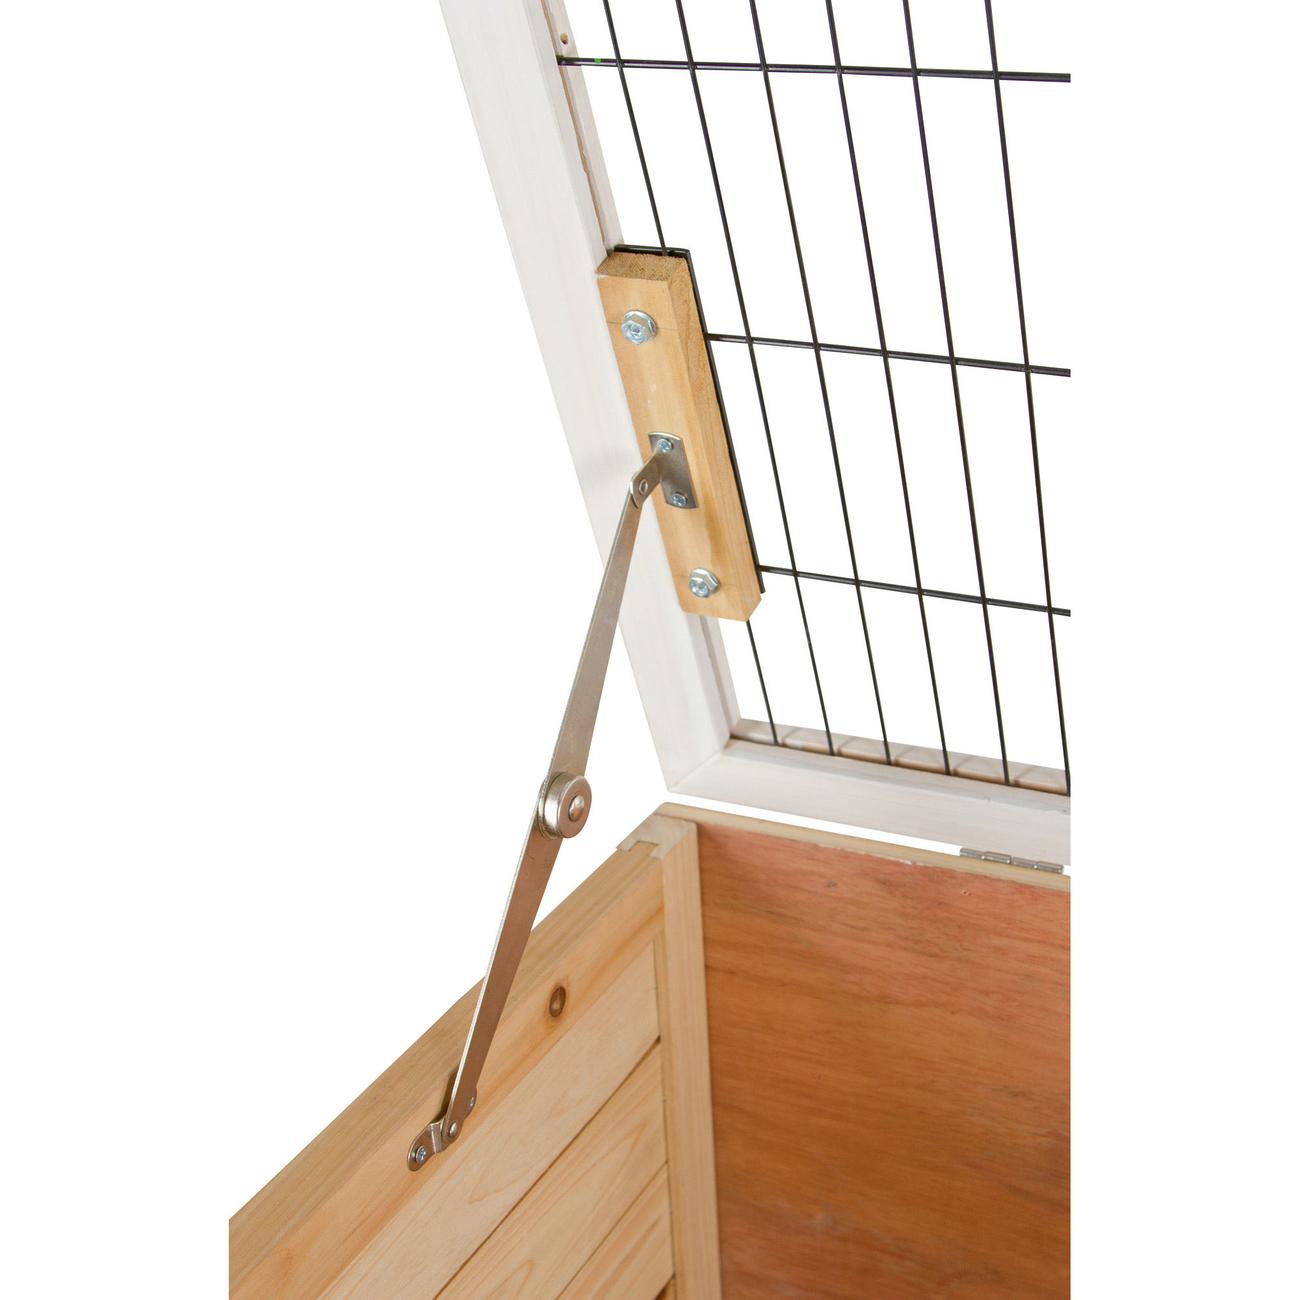 Kerbl Kleintierkäfig Indoor Deluxe 2-stöckig, Bild 4